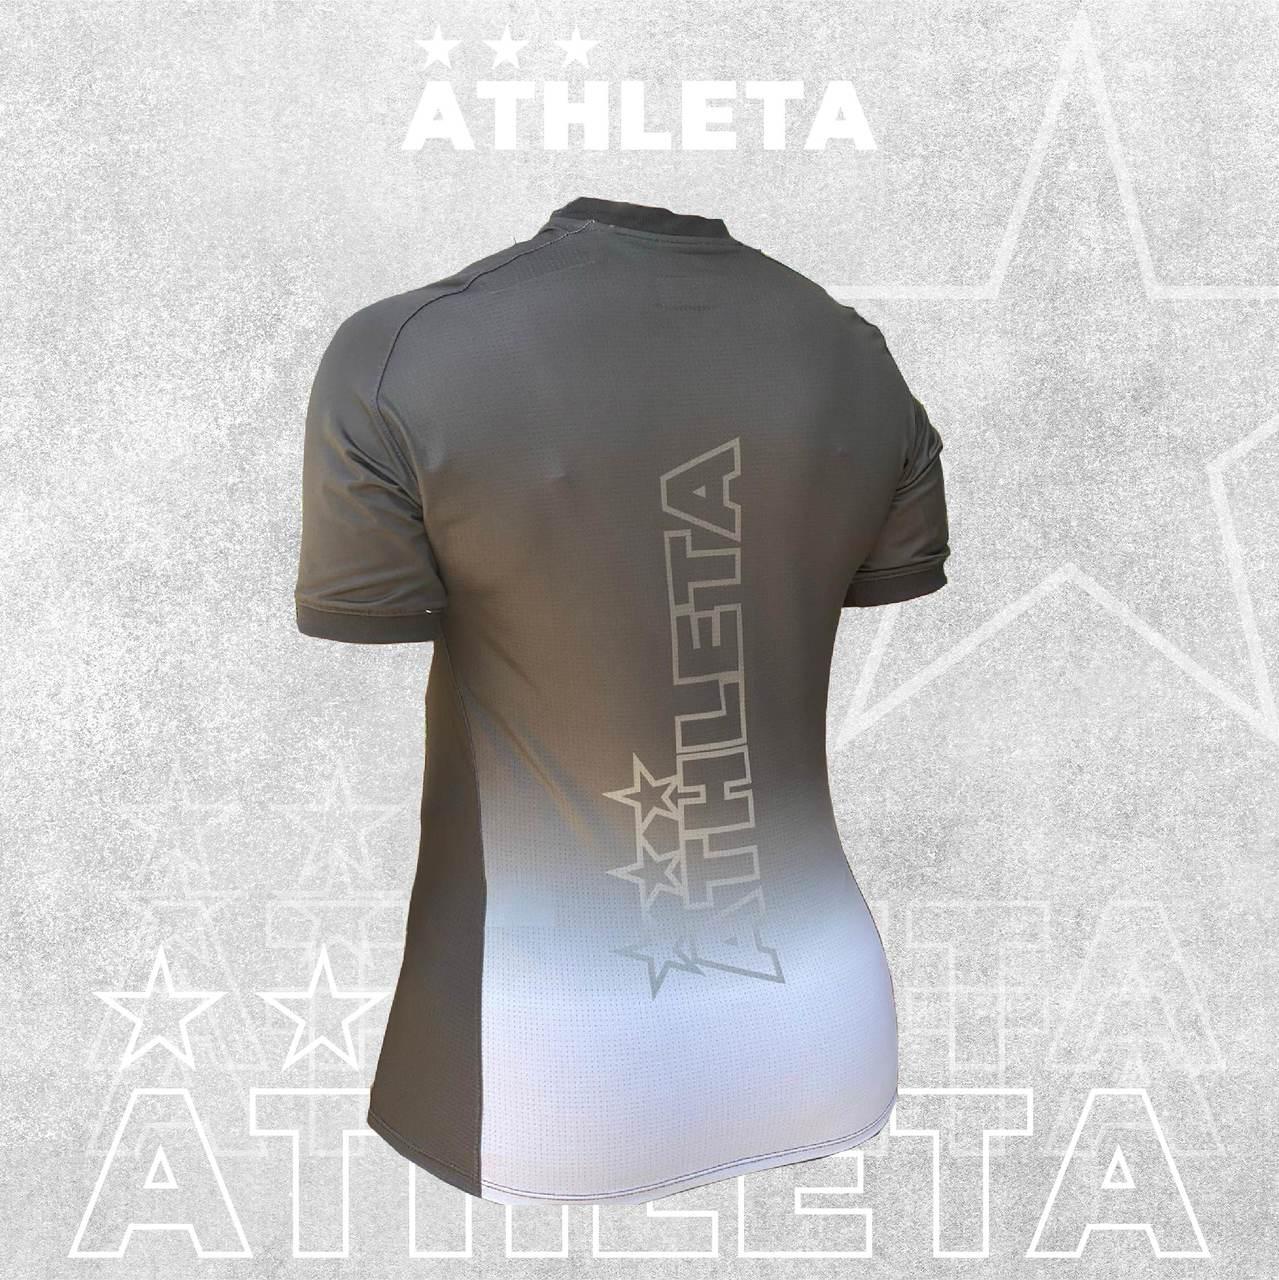 Camiseta Athleta Free Feminino - Preto com Cinza